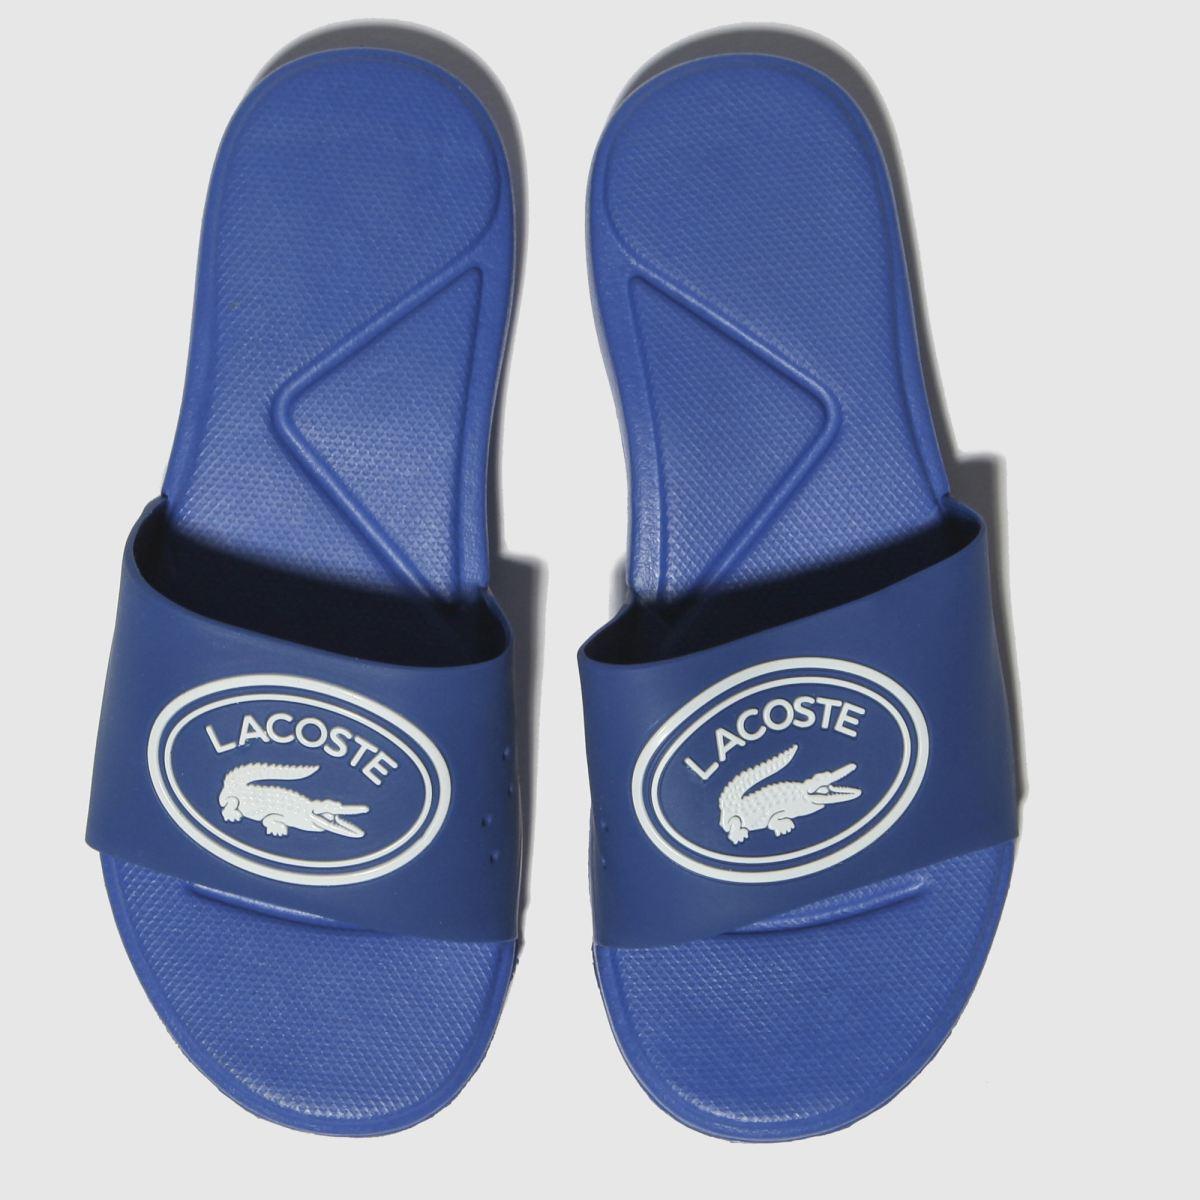 Lacoste Blue L.30 Slide Sandals Junior